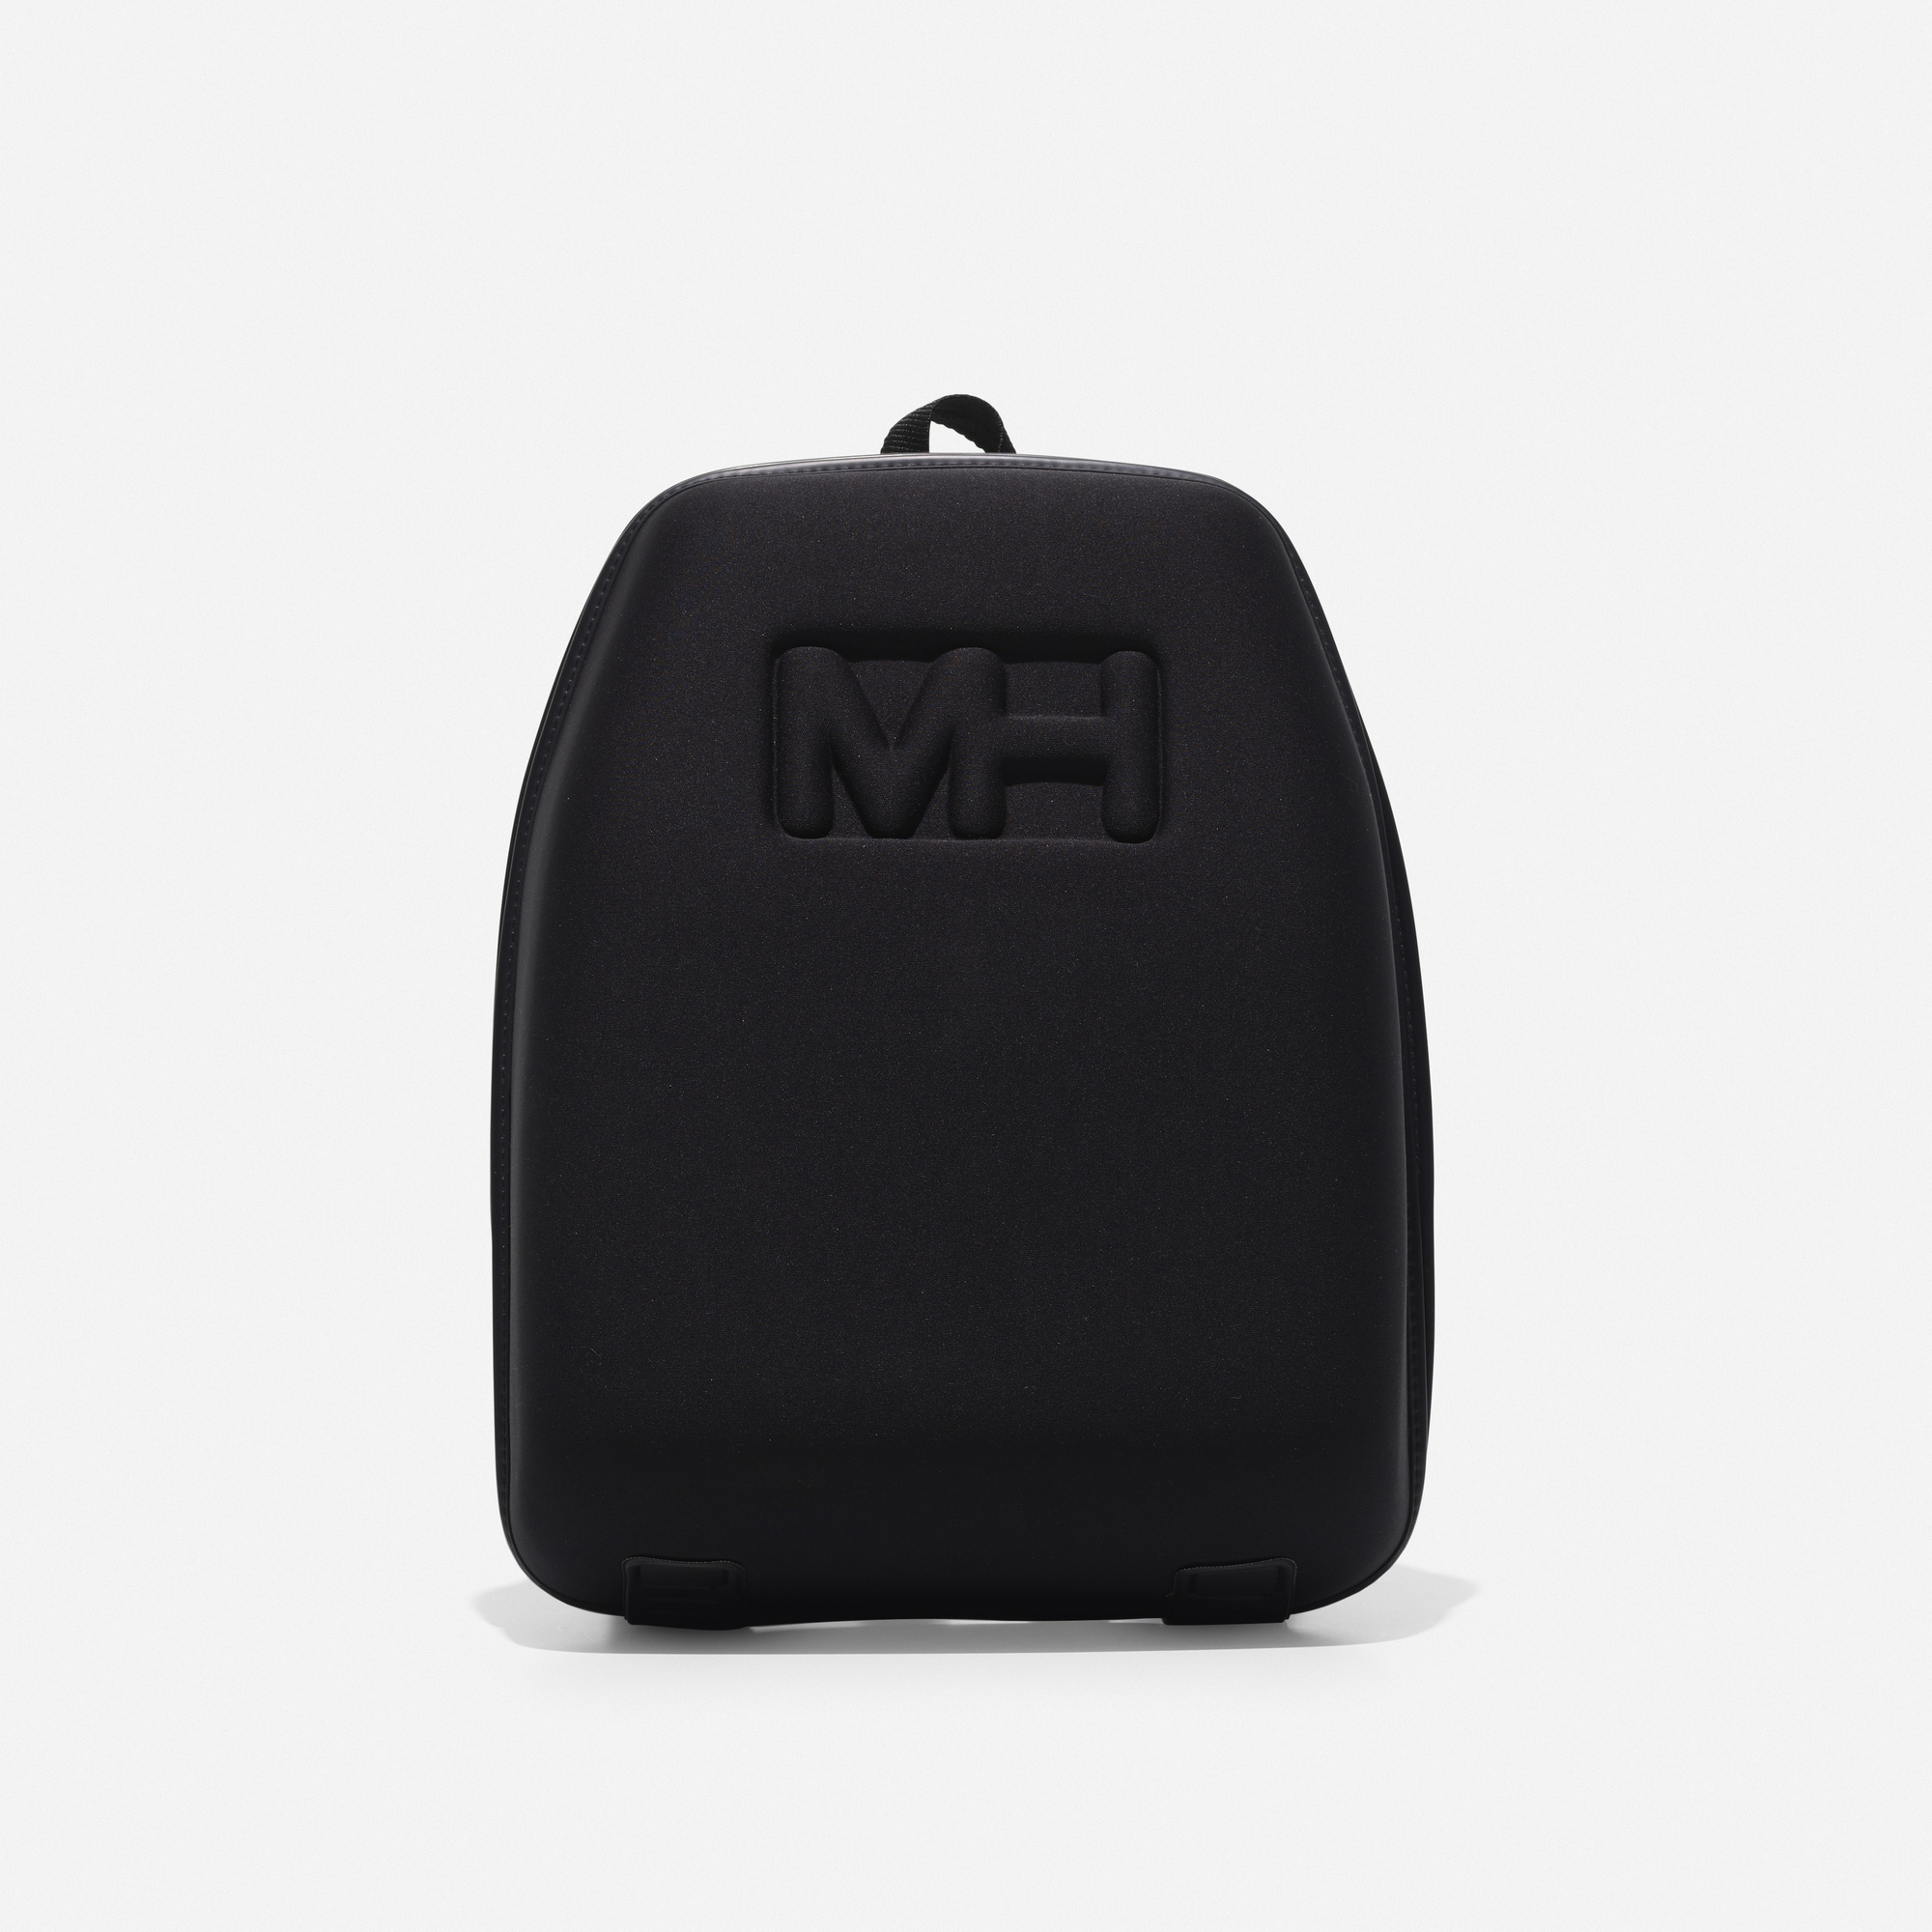 428: Makio Hasuike / Impronta backpack (1 of 2)